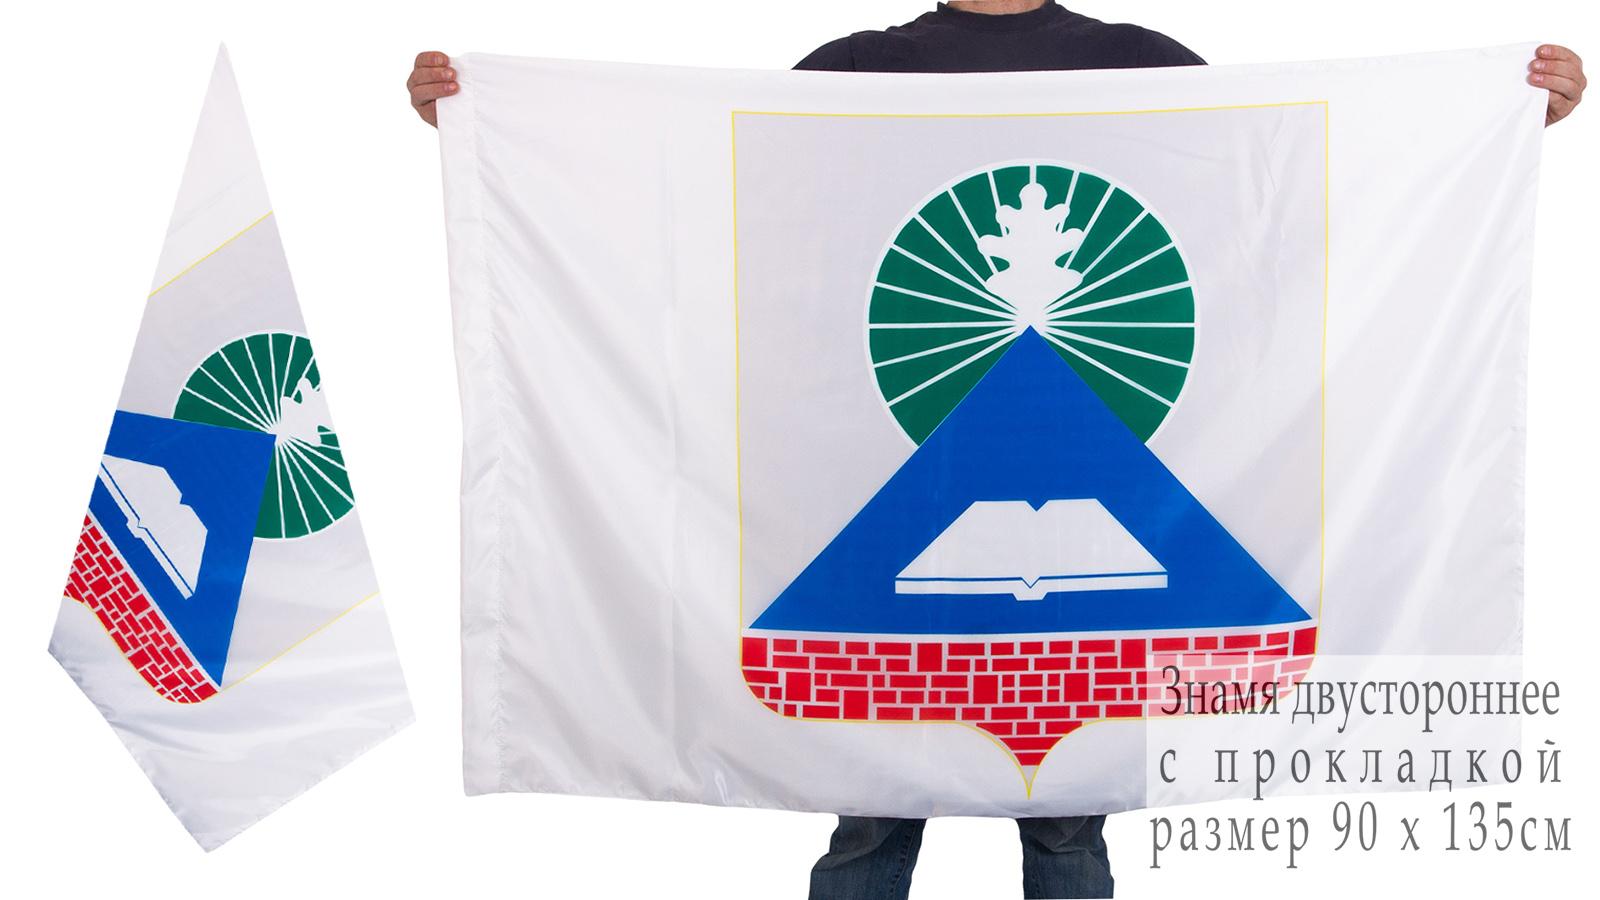 Двухсторонний флаг с гербом Новошахтинска